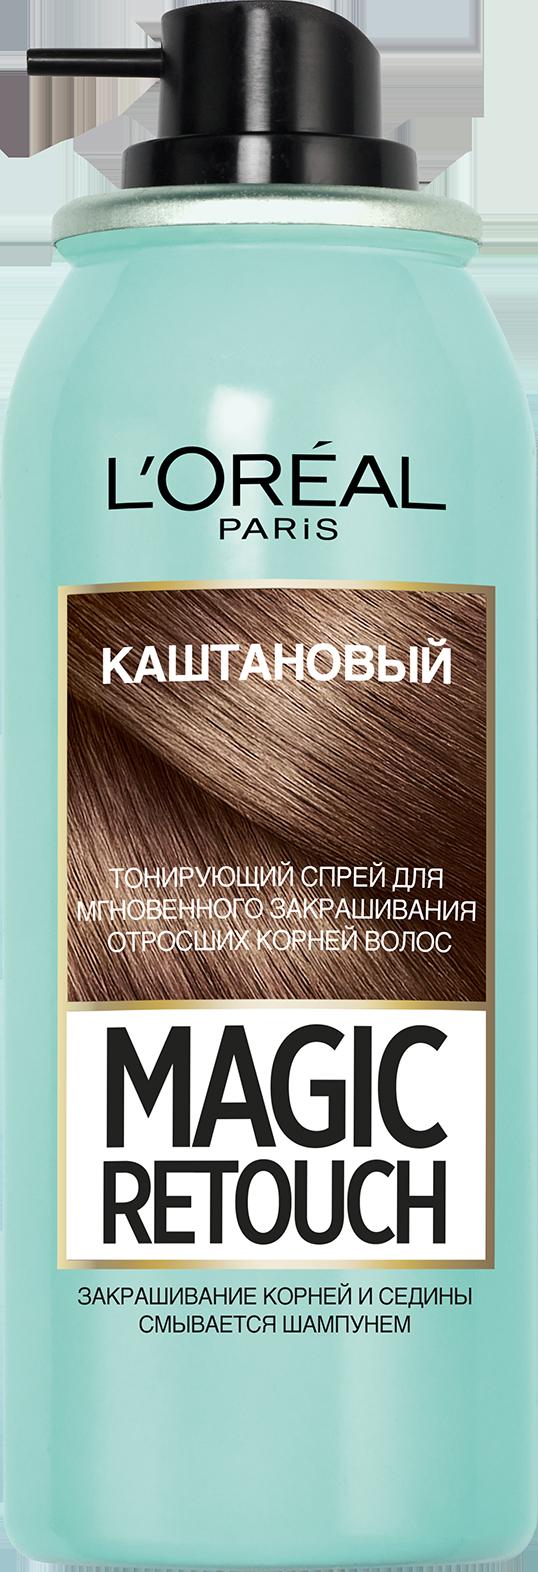 Миниатюра Спрей для волос L'Oreal Paris MAGIC RETOUCH 3 Каштан Тонирующий №5